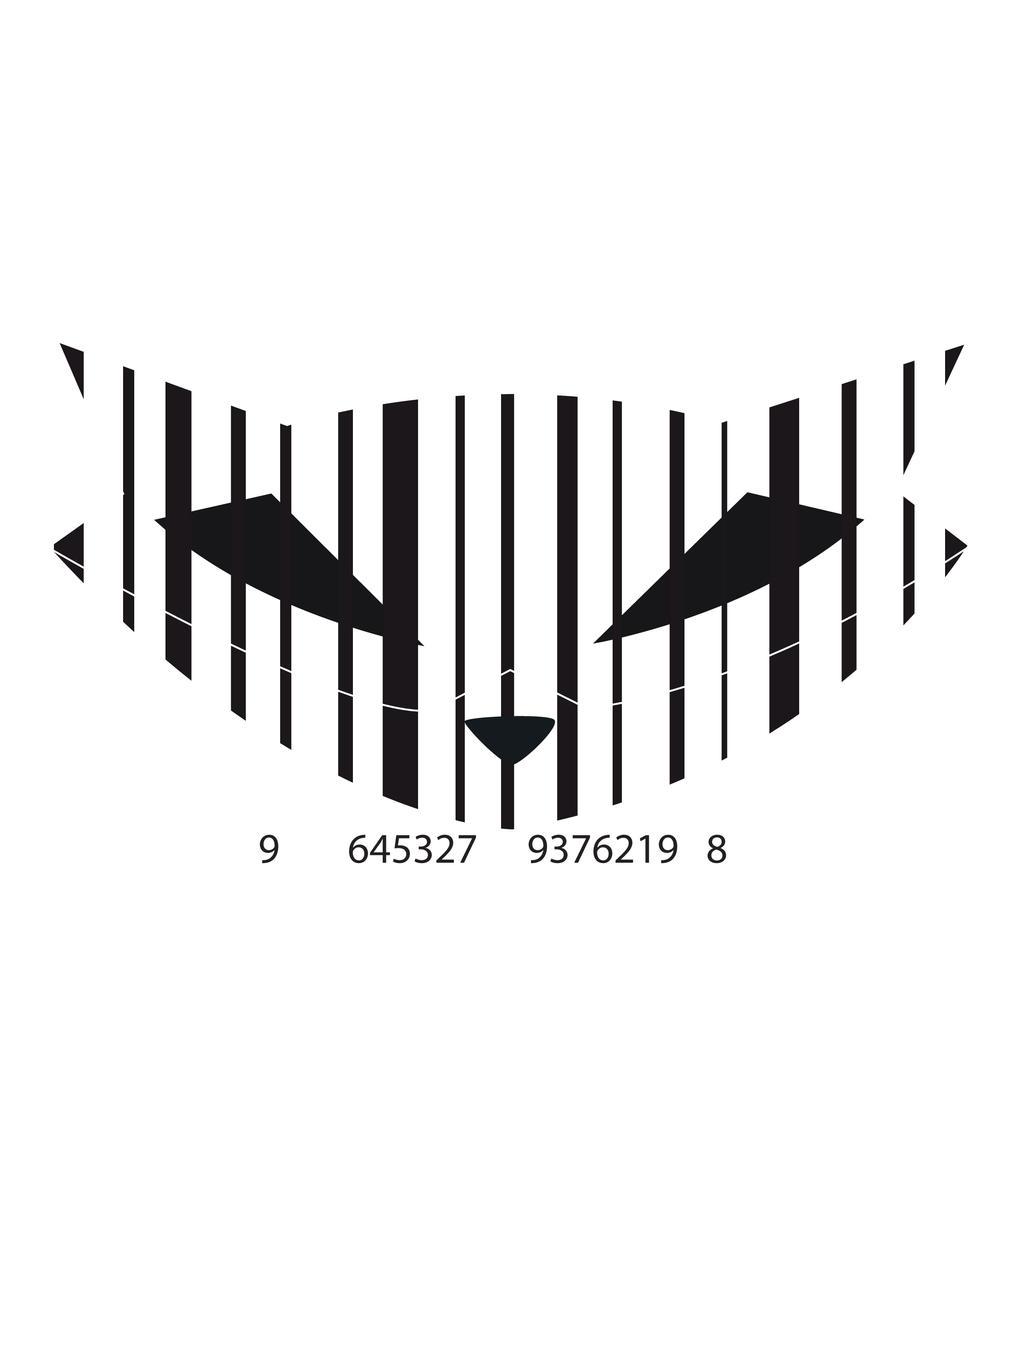 Sly Cooper Vanity Barcode by PurpleNaruga